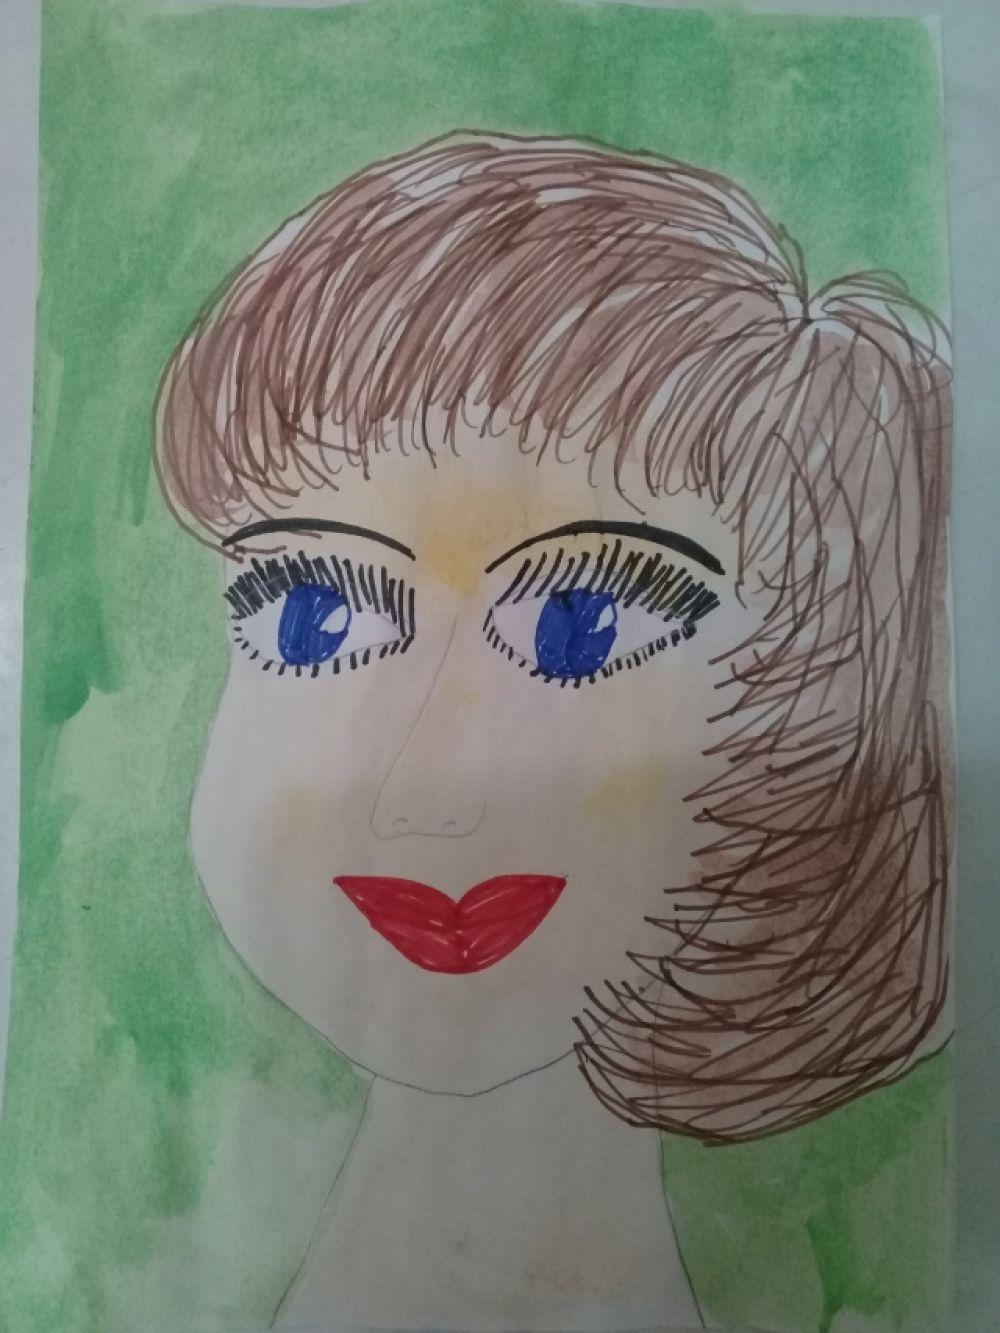 Участник №47. Зубкова Елизавета